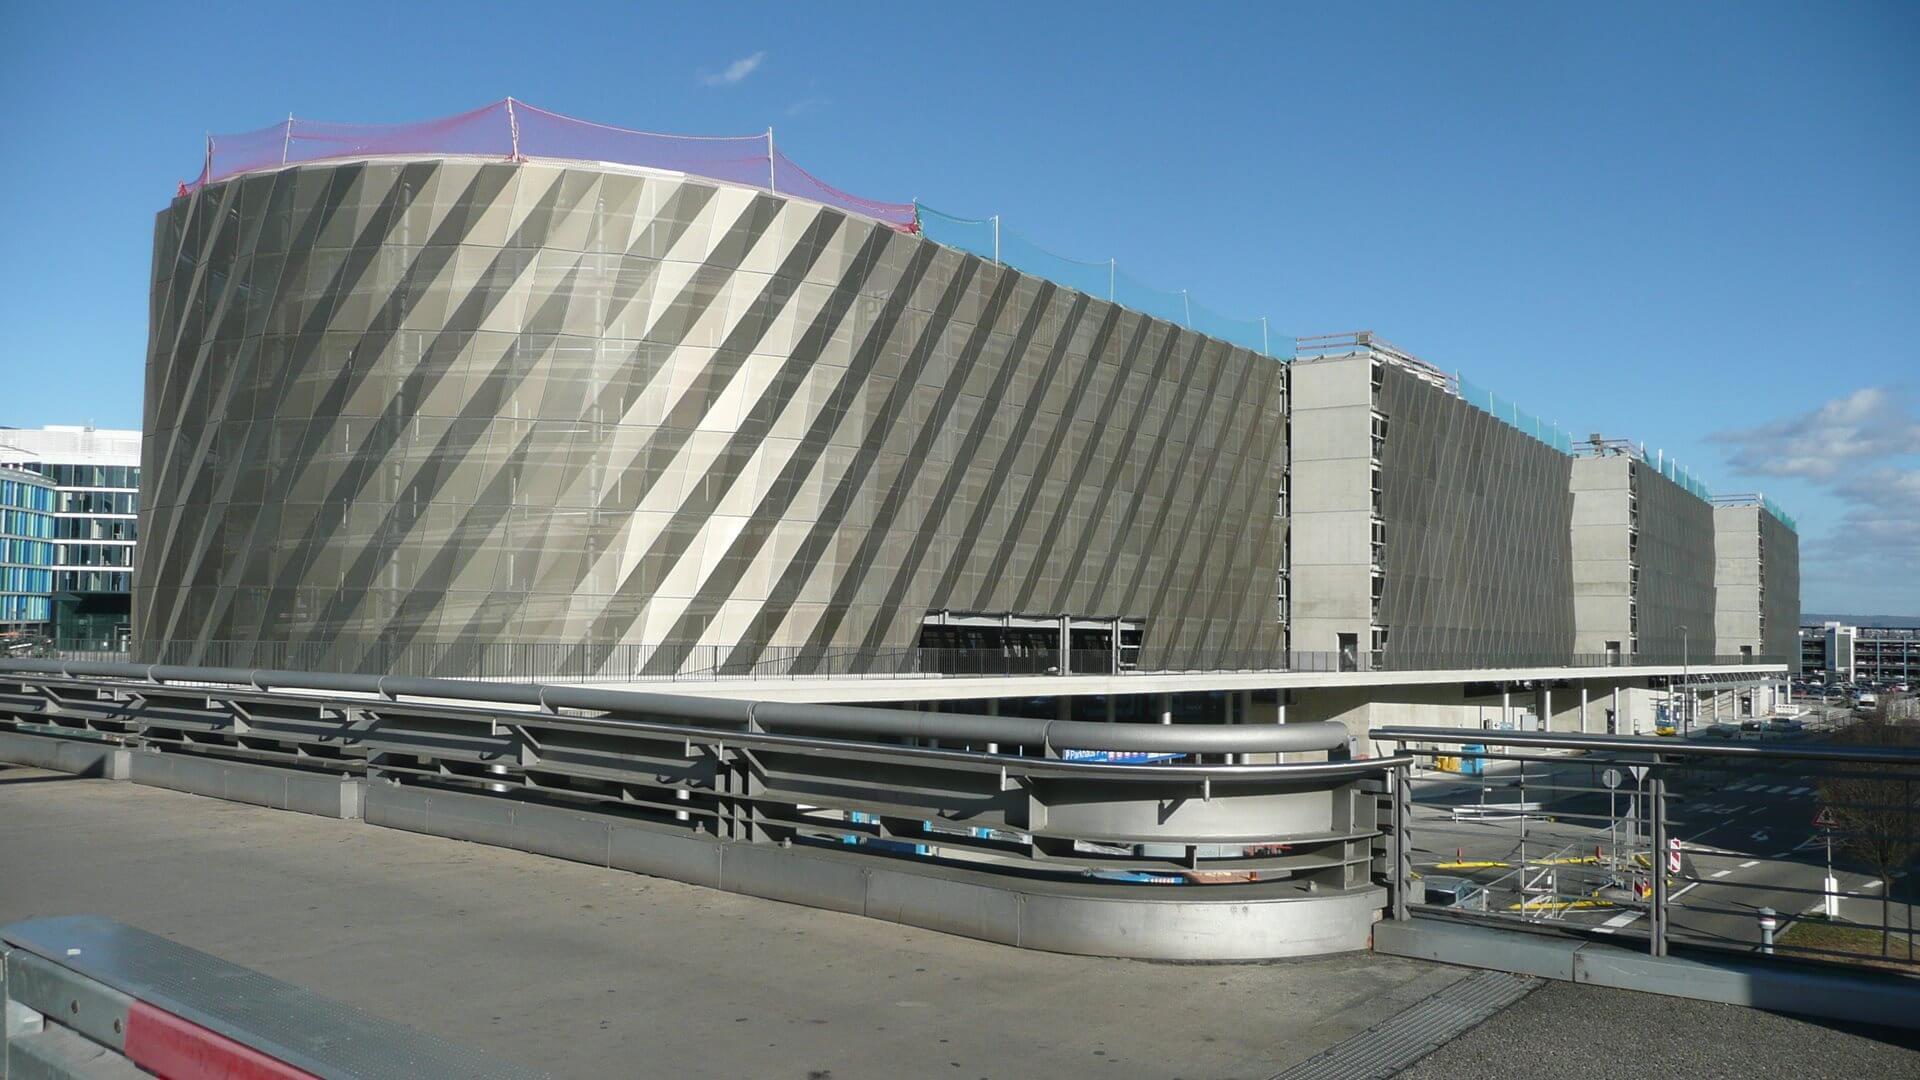 Parkhaus am Flughafen Stuttgart